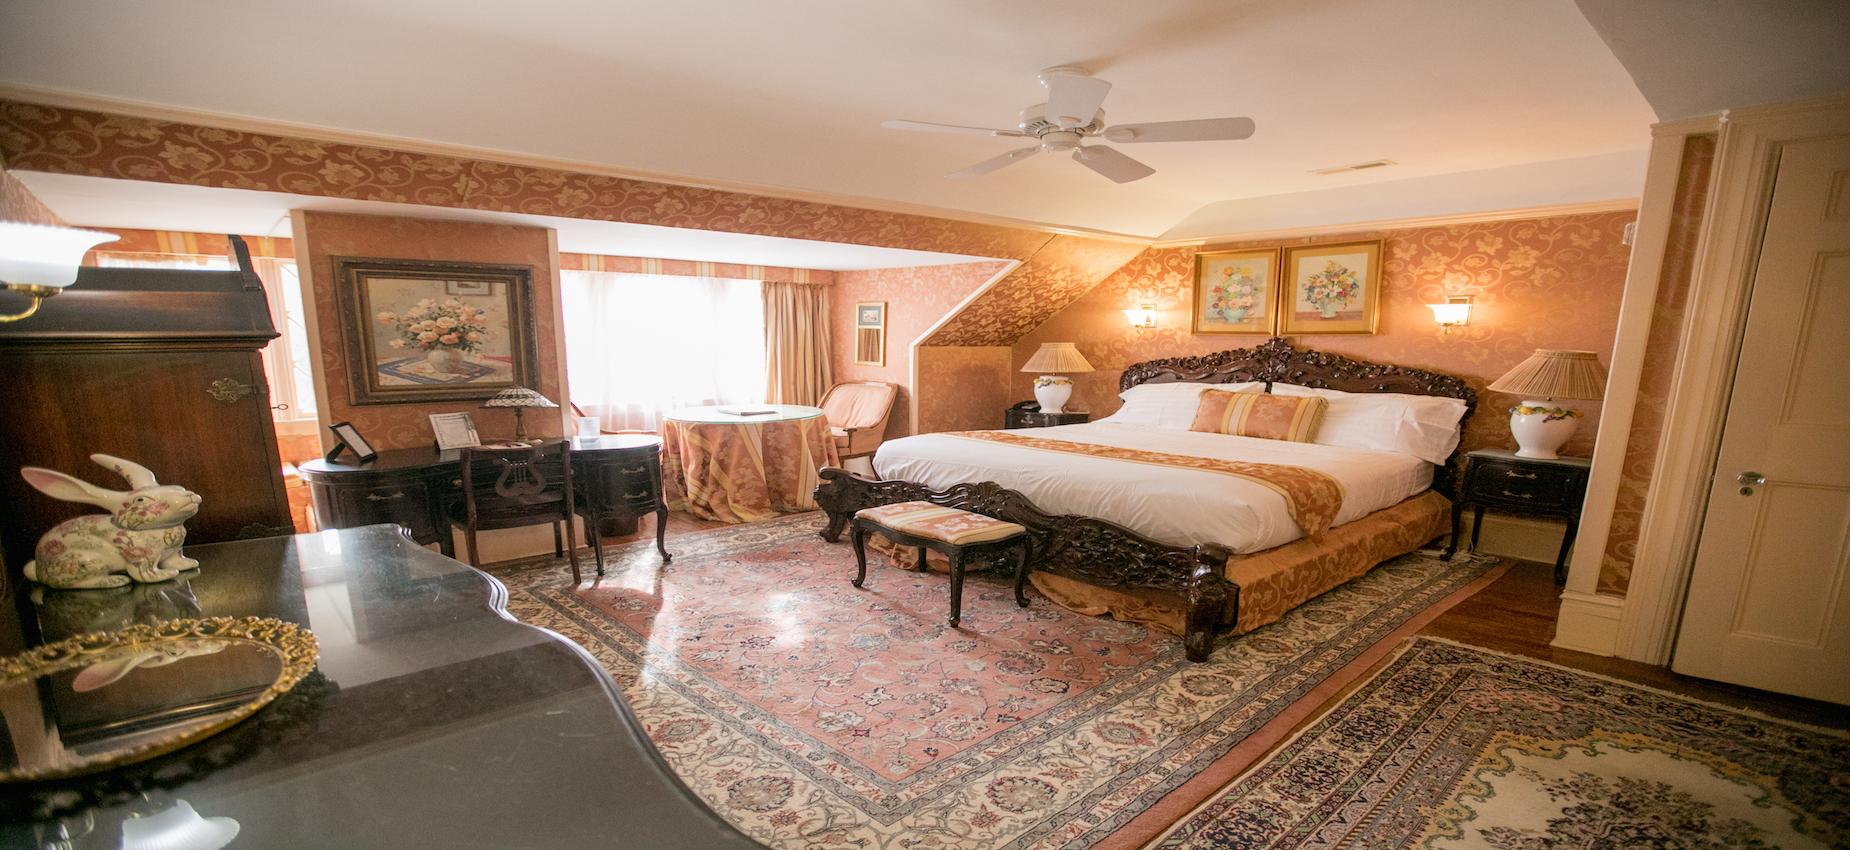 Aphrodites Retreat Baltimore MD Bed Amp Breakfast